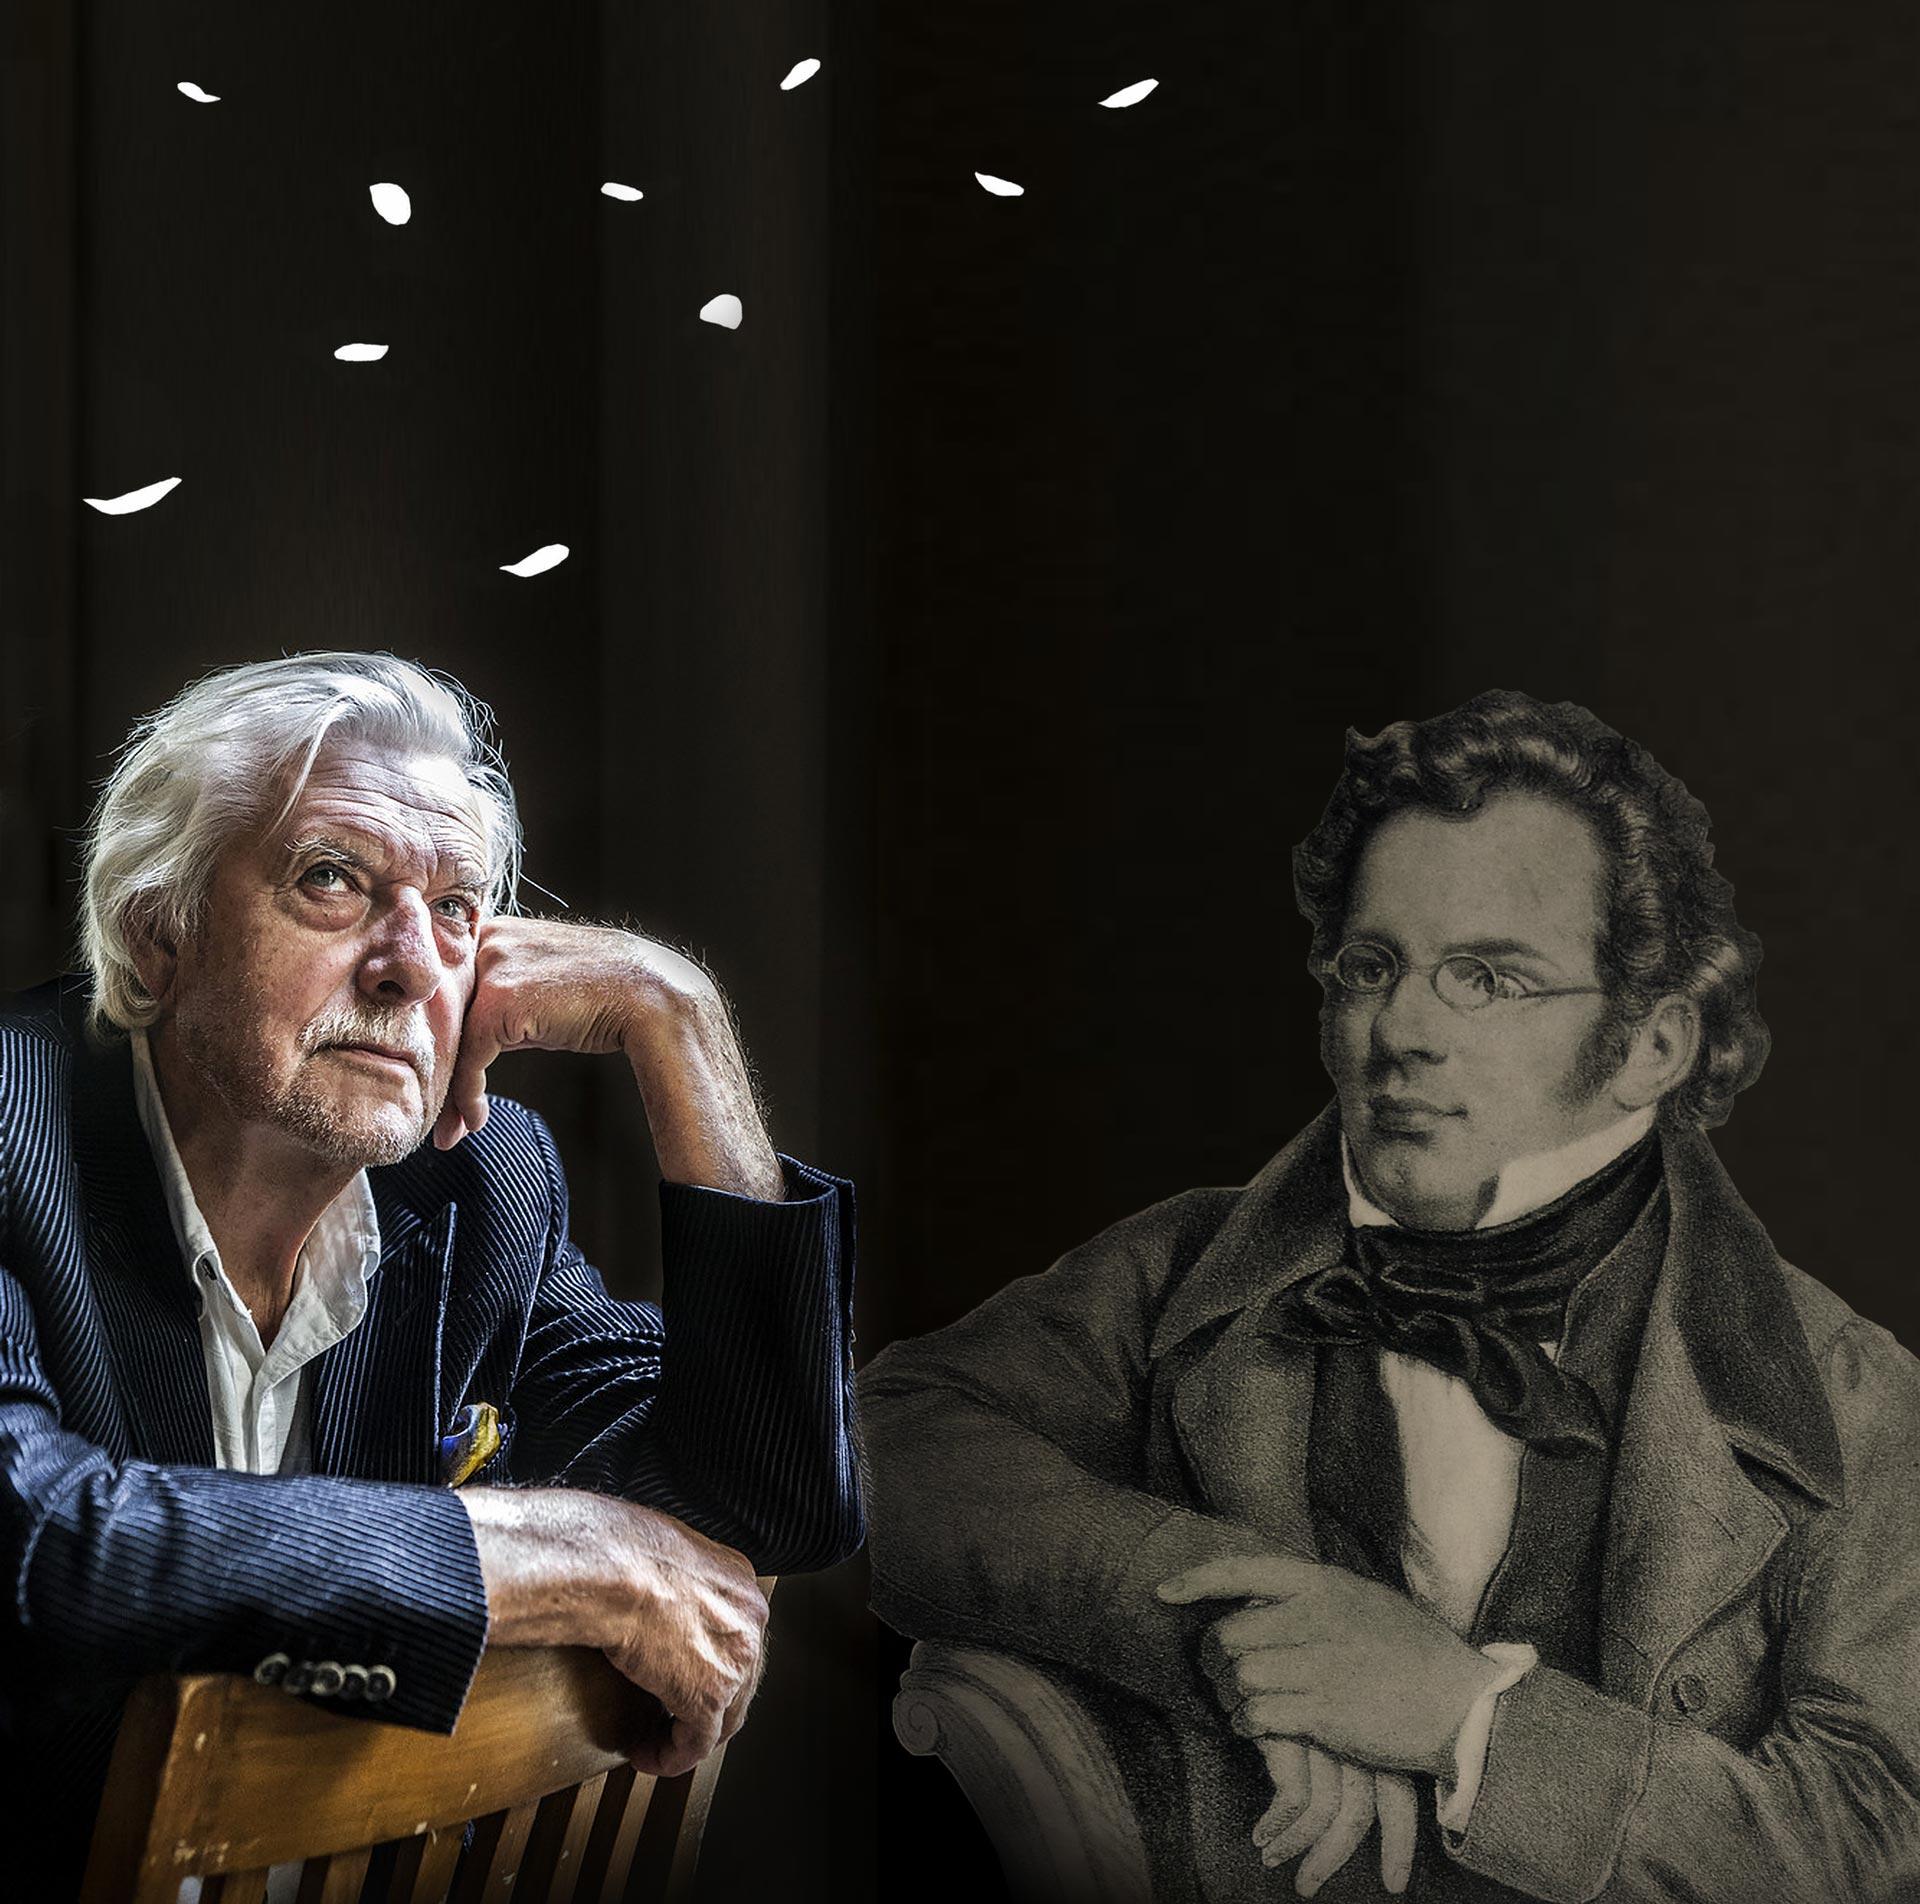 boekenweek siebelink schubert klassieke muziek